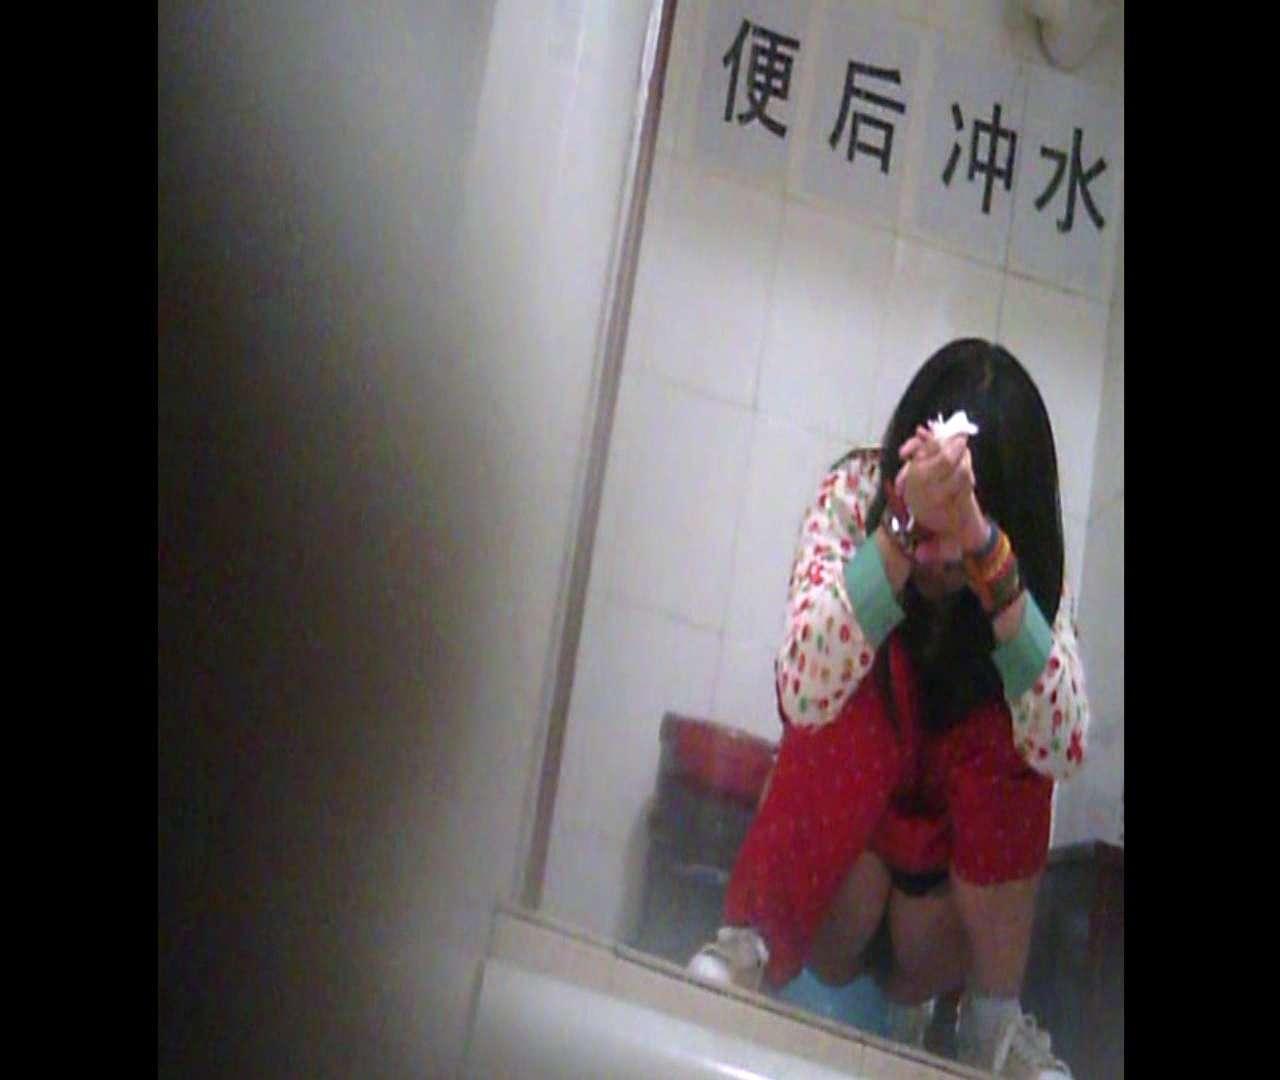 Vol.01 赤のパンツスタイルがとっても眩しい!! 洗面所 | 丸見え  61画像 46